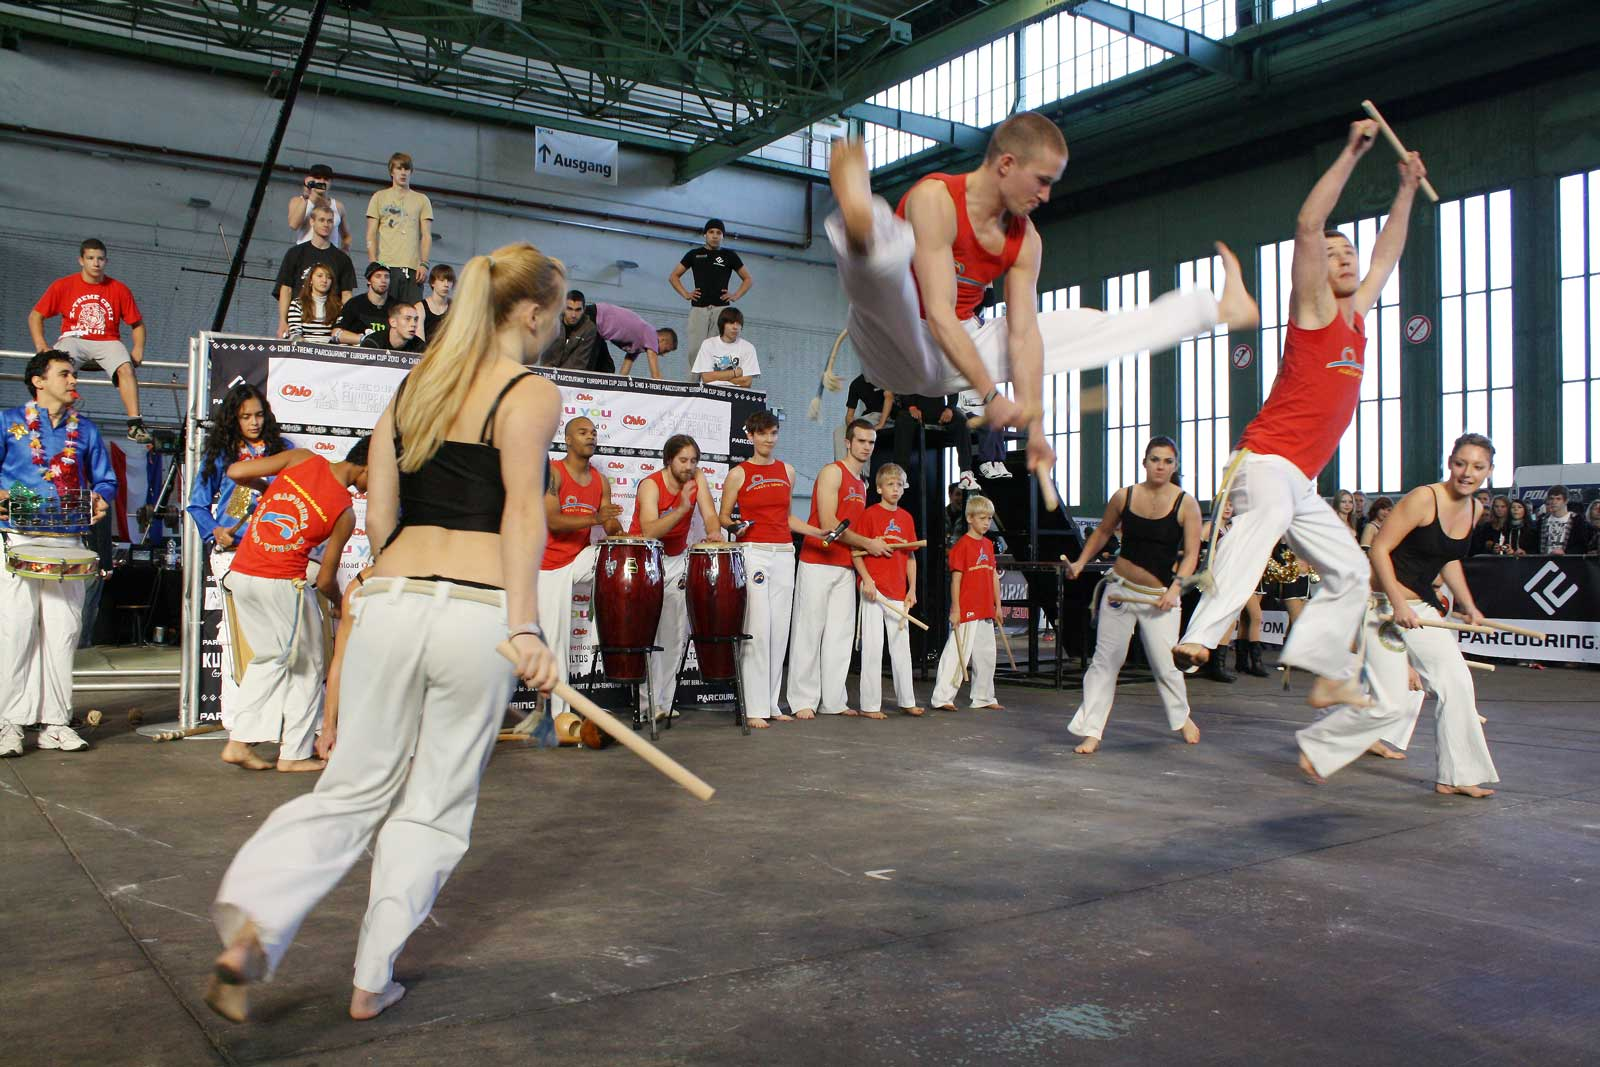 Capoeira Akademie Berlin: Musik gehört zu Capoeira